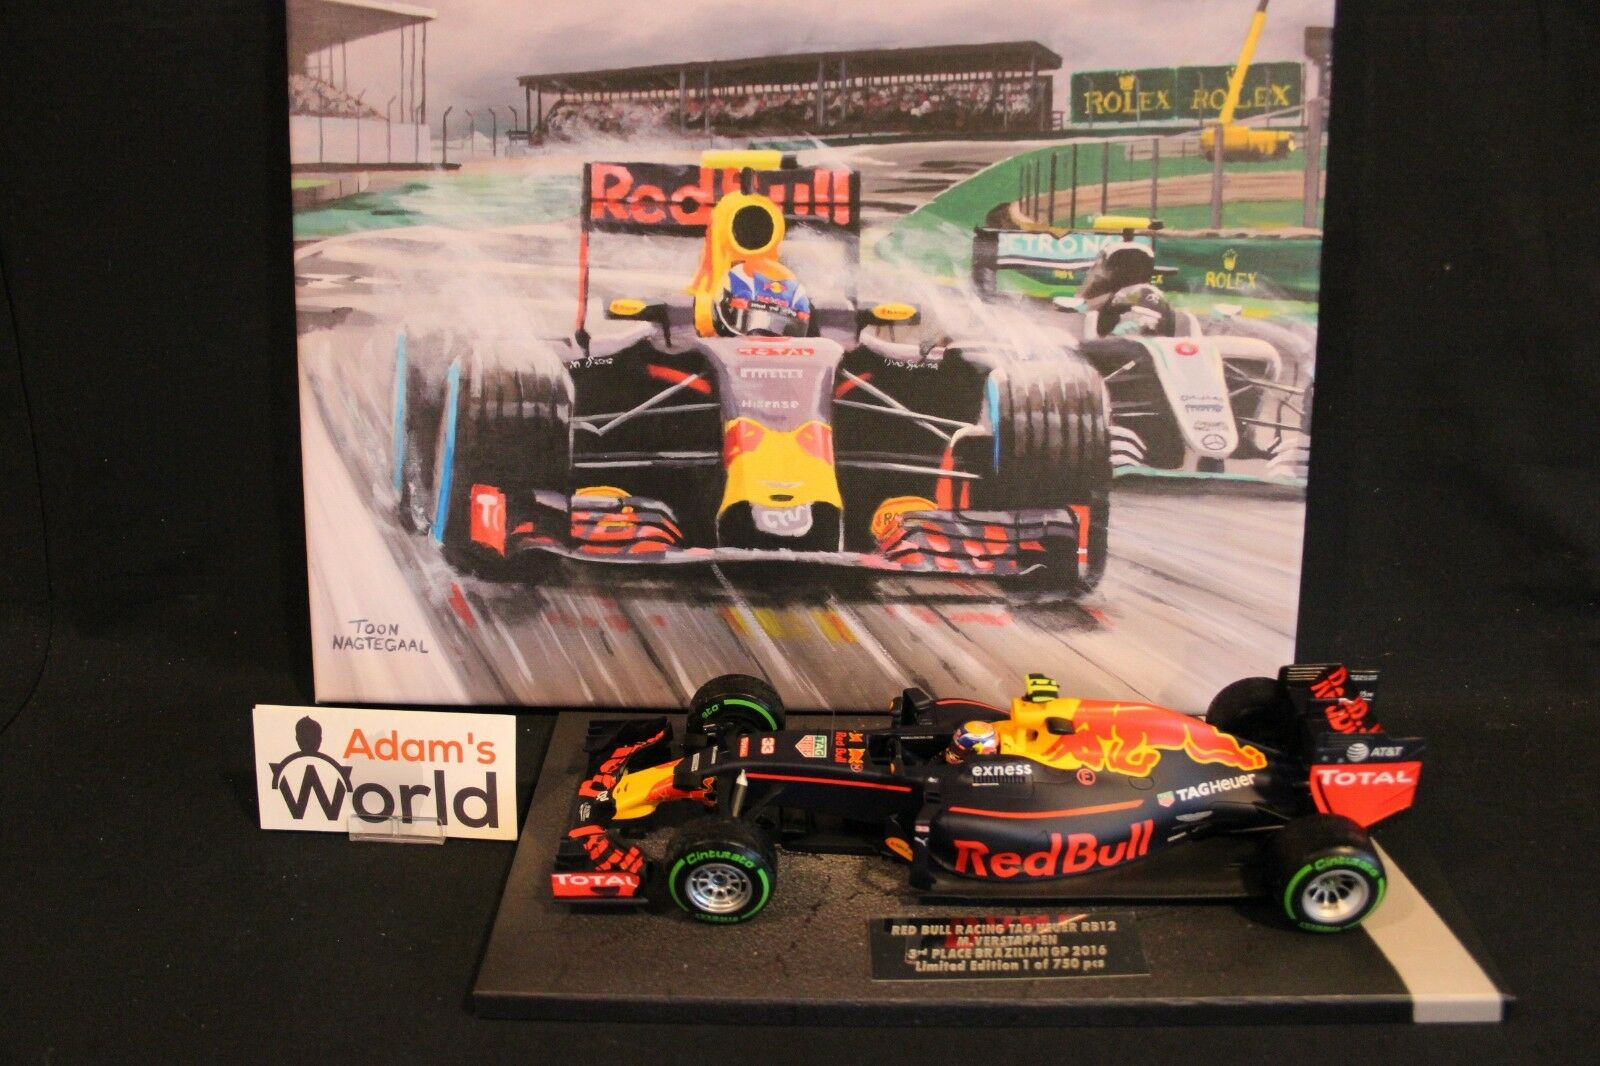 Gift set Max Verstappen 3rd place Brazilian Grand Prix 2016  Rain King